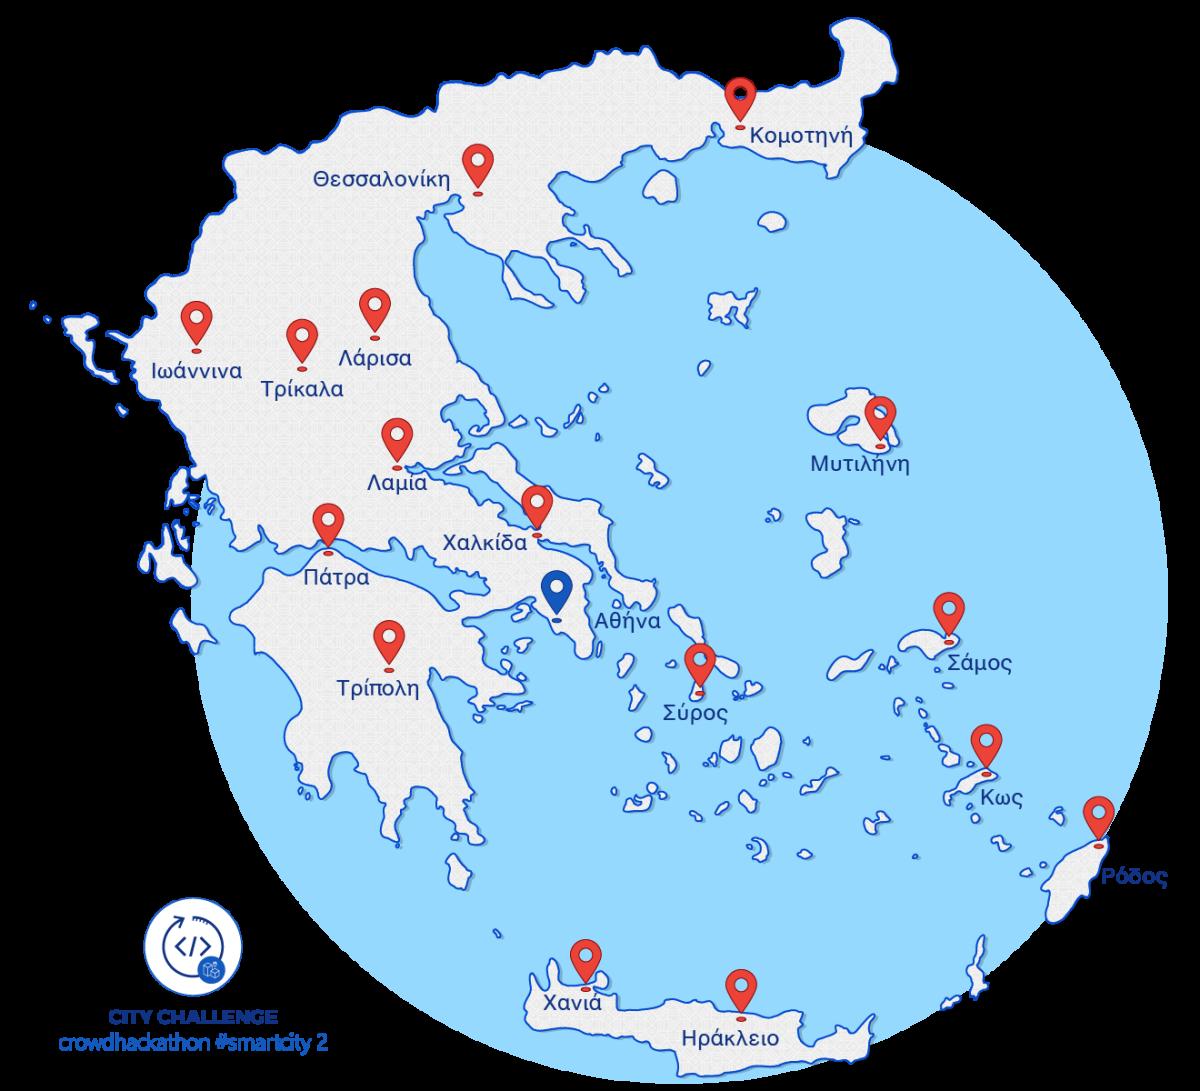 H COSMOTE στηρίζει το Μαραθώνιο Καινοτομίας της ΚΕΔΕ για «έξυπνες πόλεις»